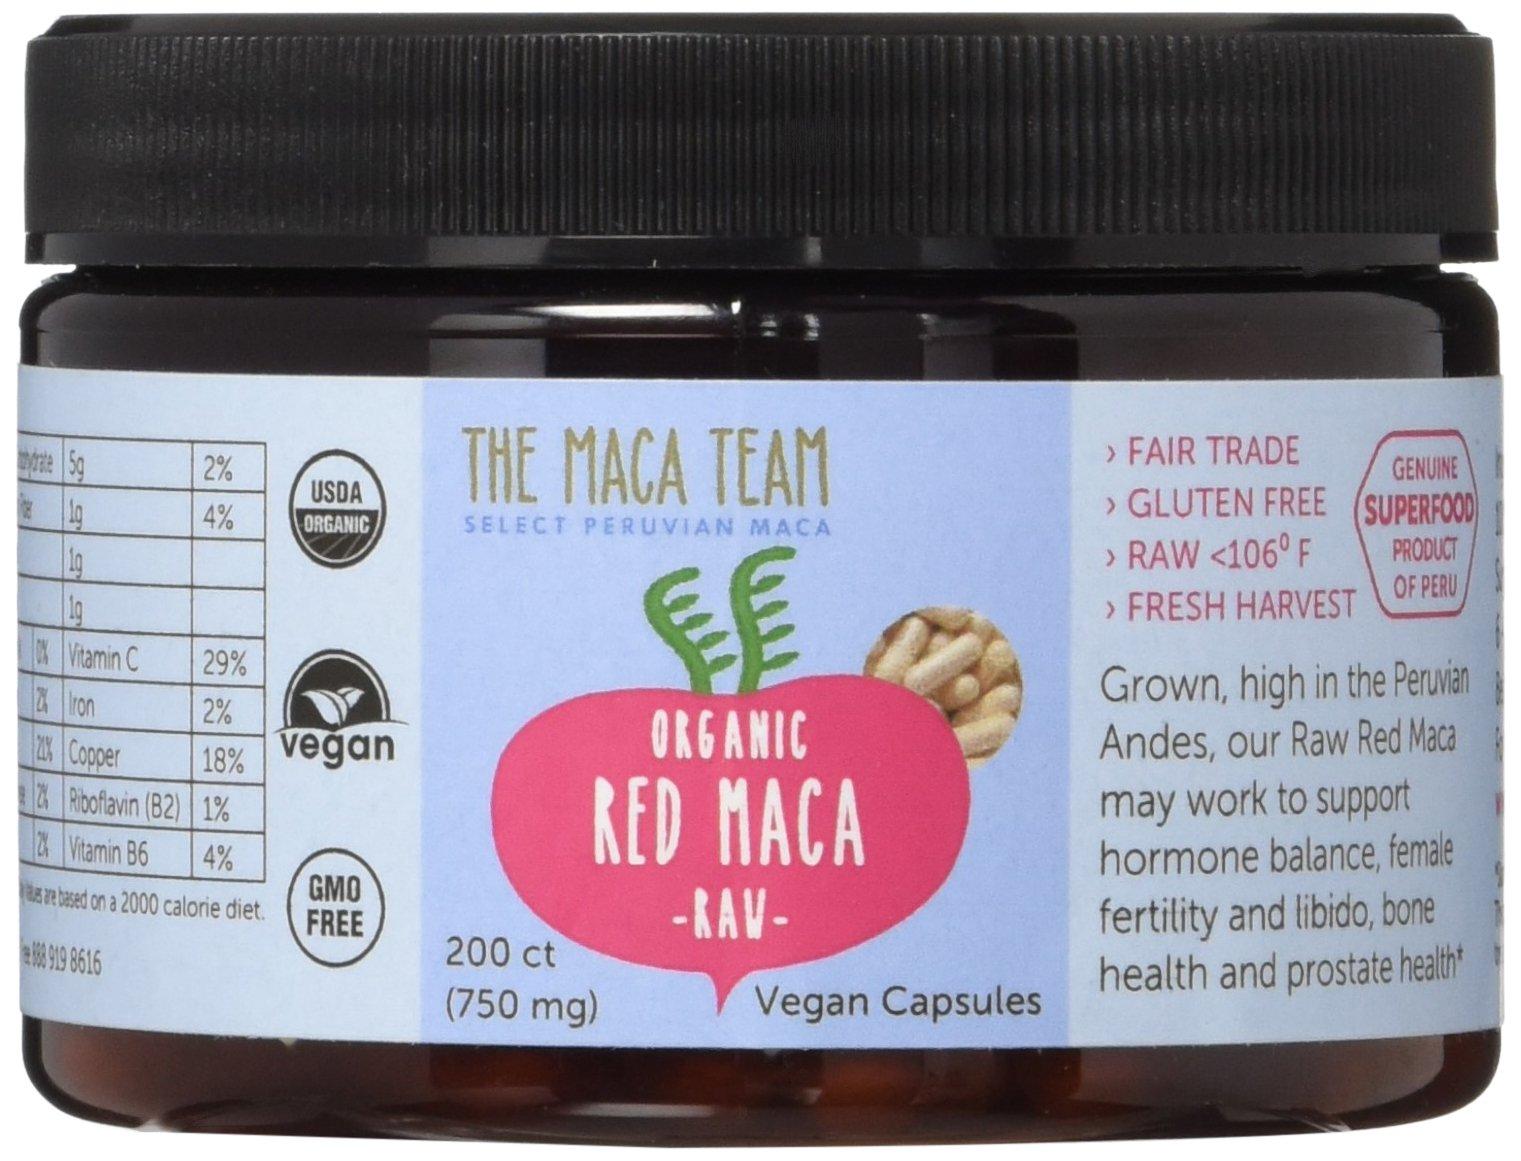 Red Maca Capsules - Raw, Certified Organic, Fresh Harvest From Peru, Fair Trade, Gmo-free, Gluten Free and Vegan - 750 Mg, 200 Ct